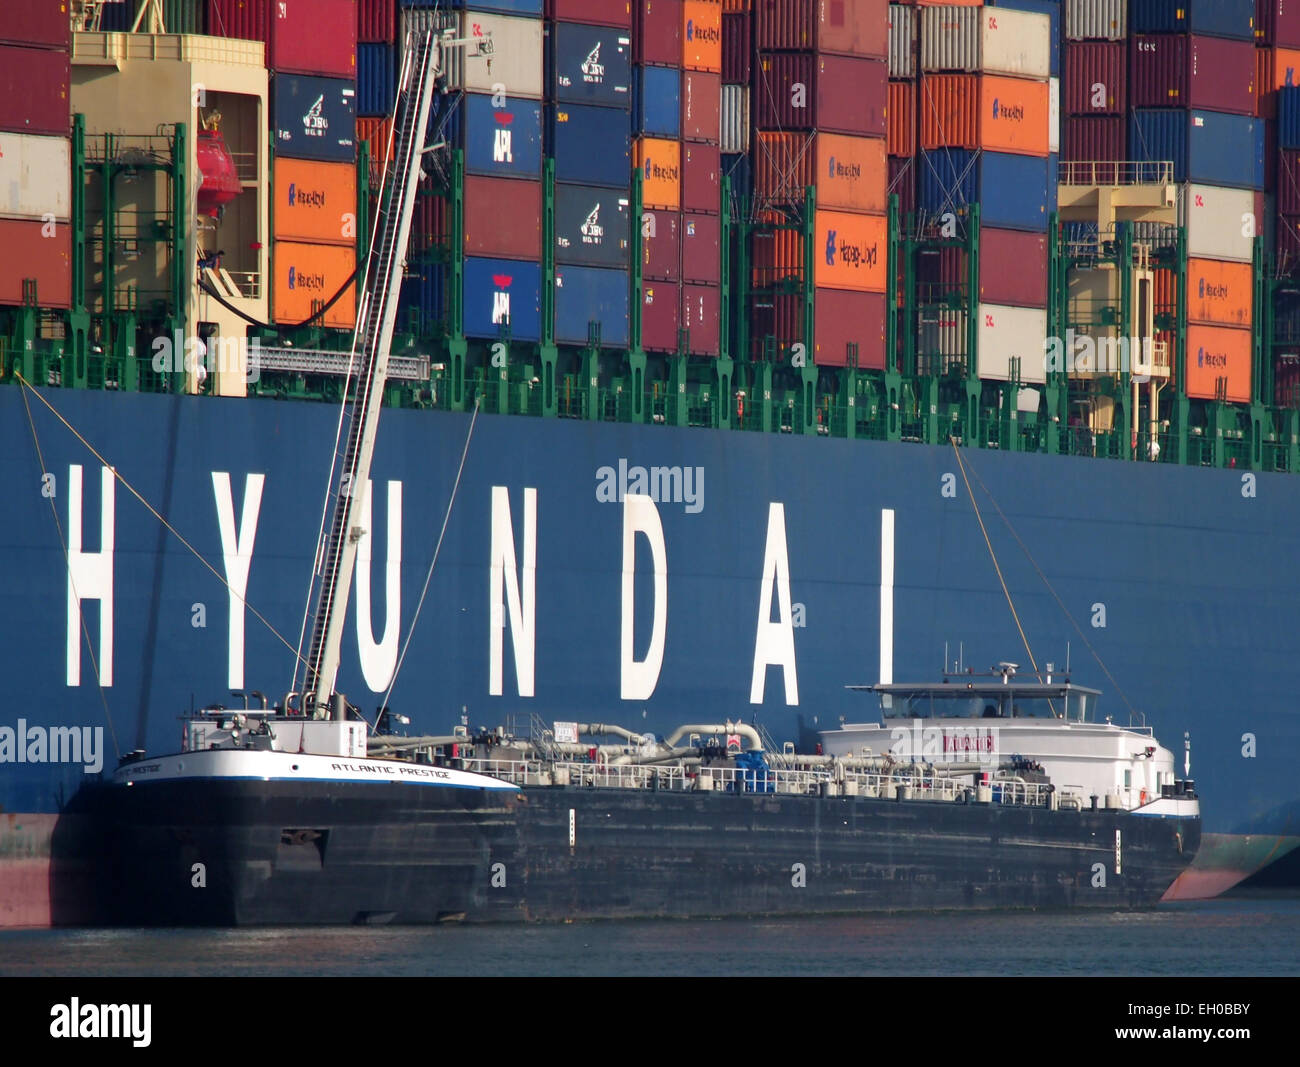 Atlantic Prestige ENI 02333489, Amazonehaven, Port of Rotterdam, pic1 - Stock Image